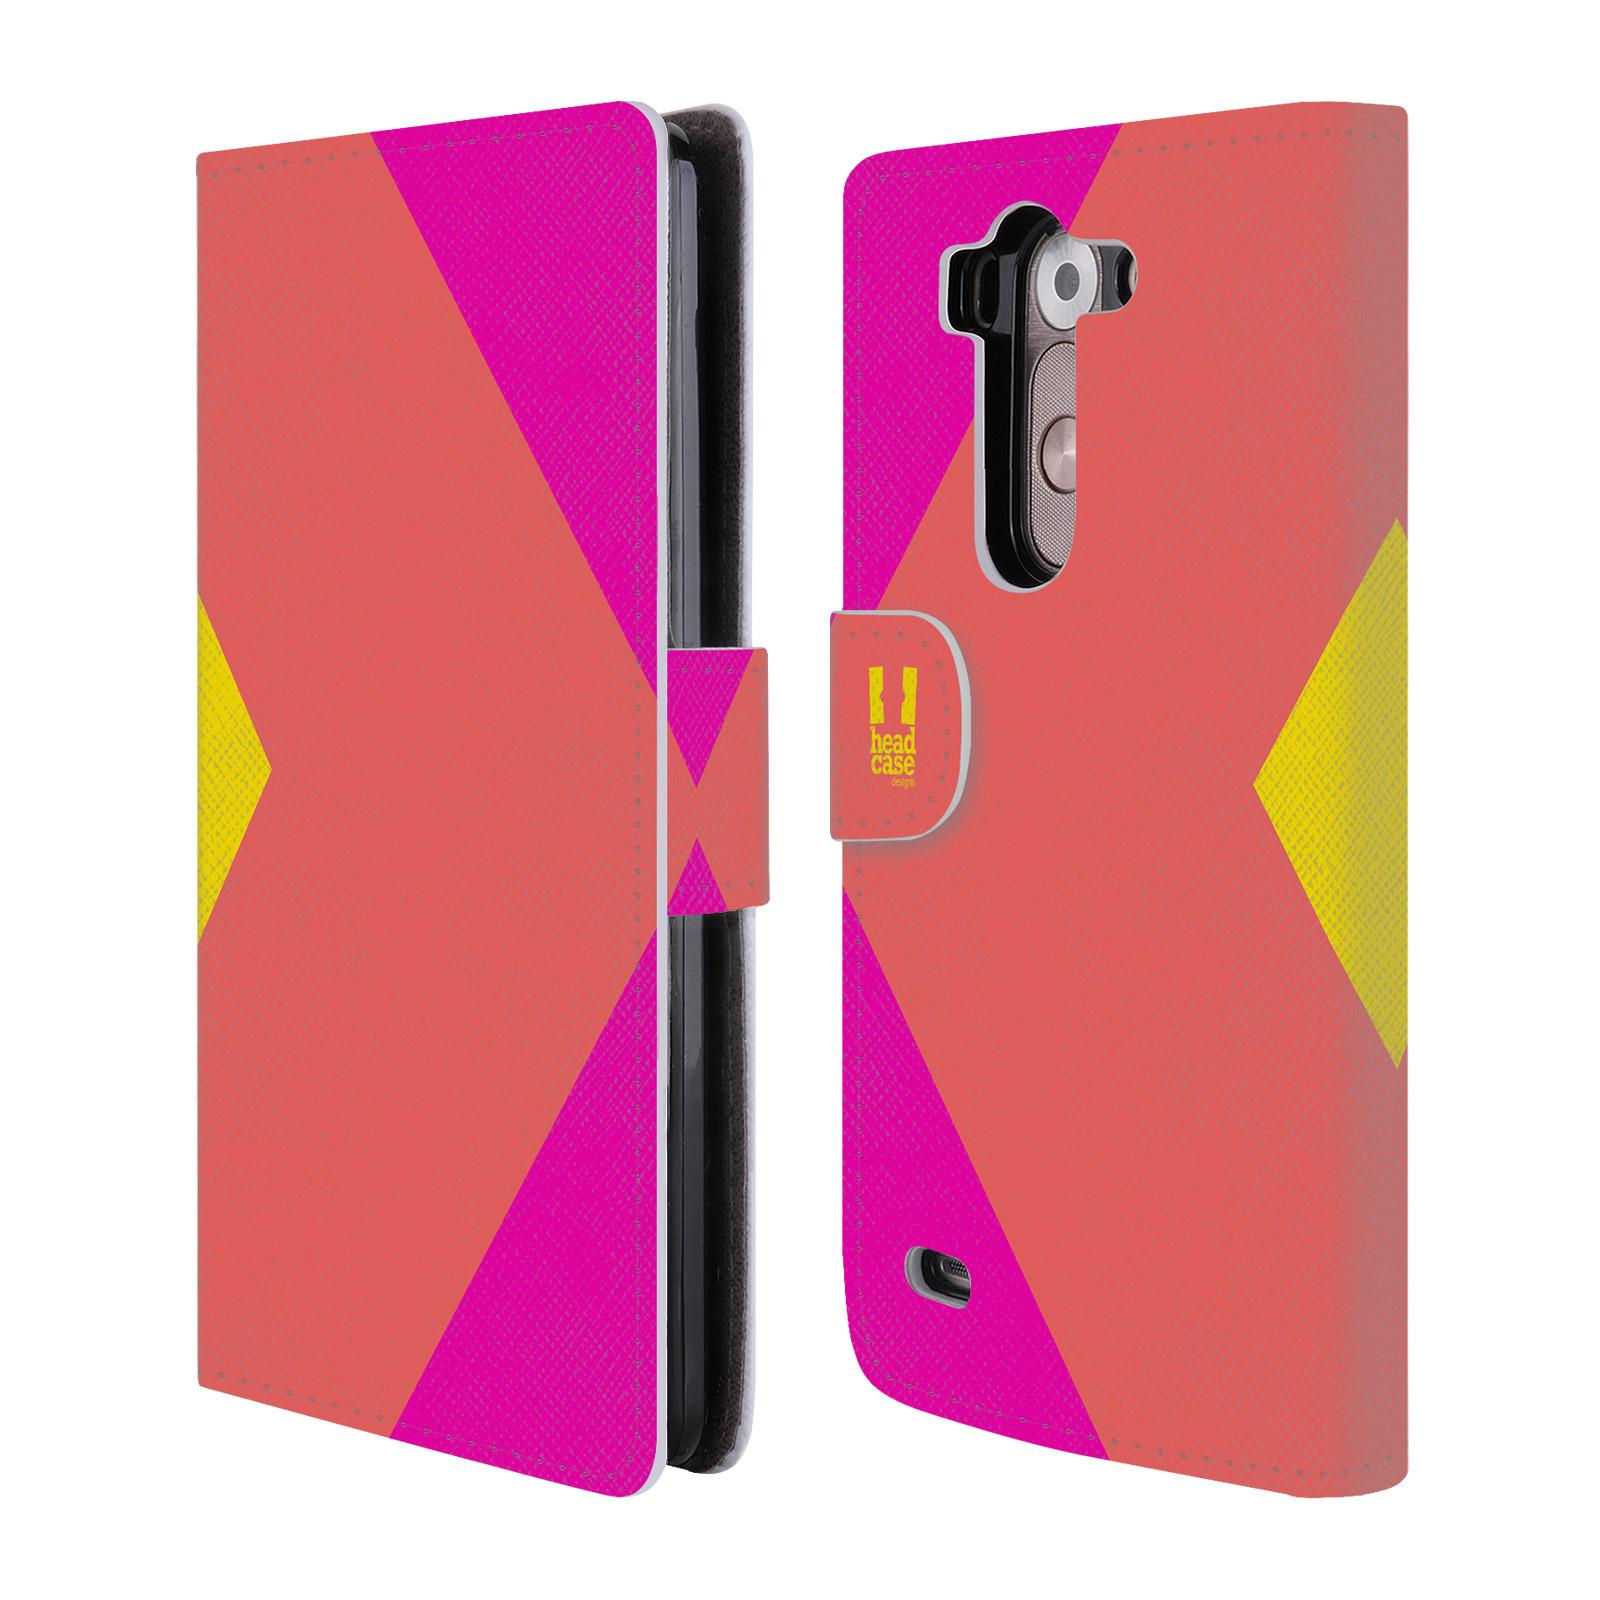 HEAD CASE Flipové pouzdro pro mobil LG G3s barevné tvary růžová korál